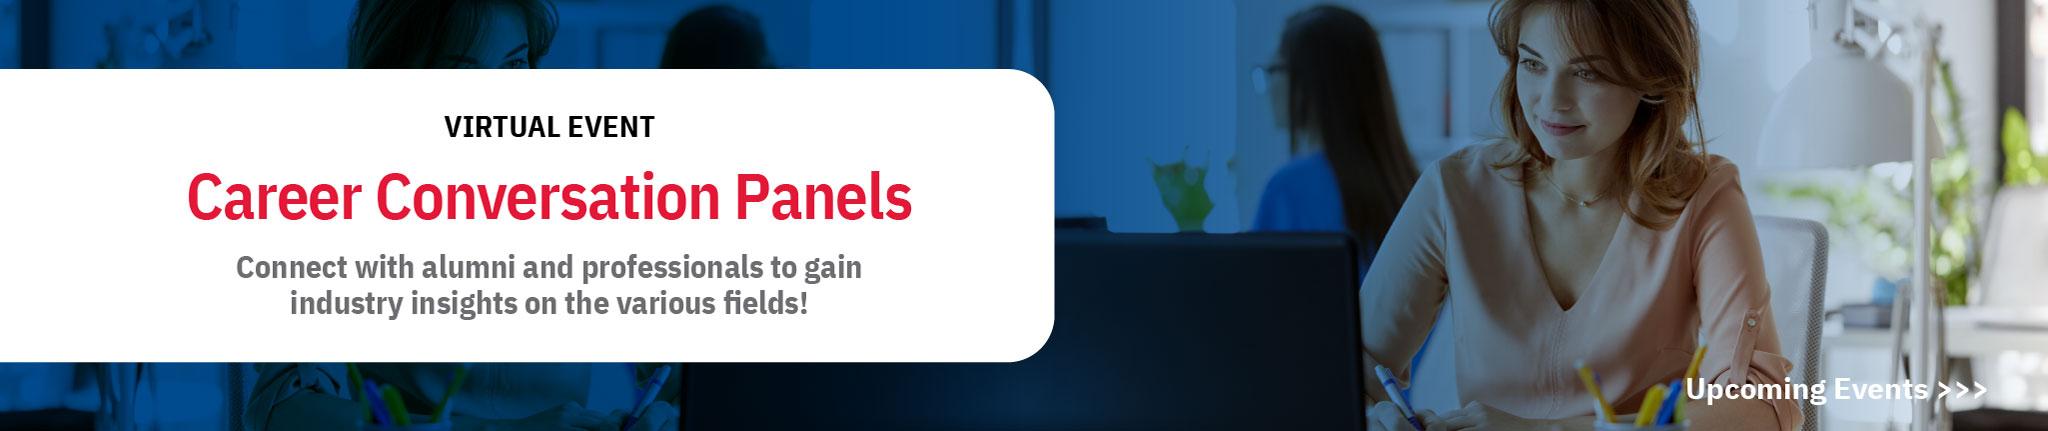 CC Panels